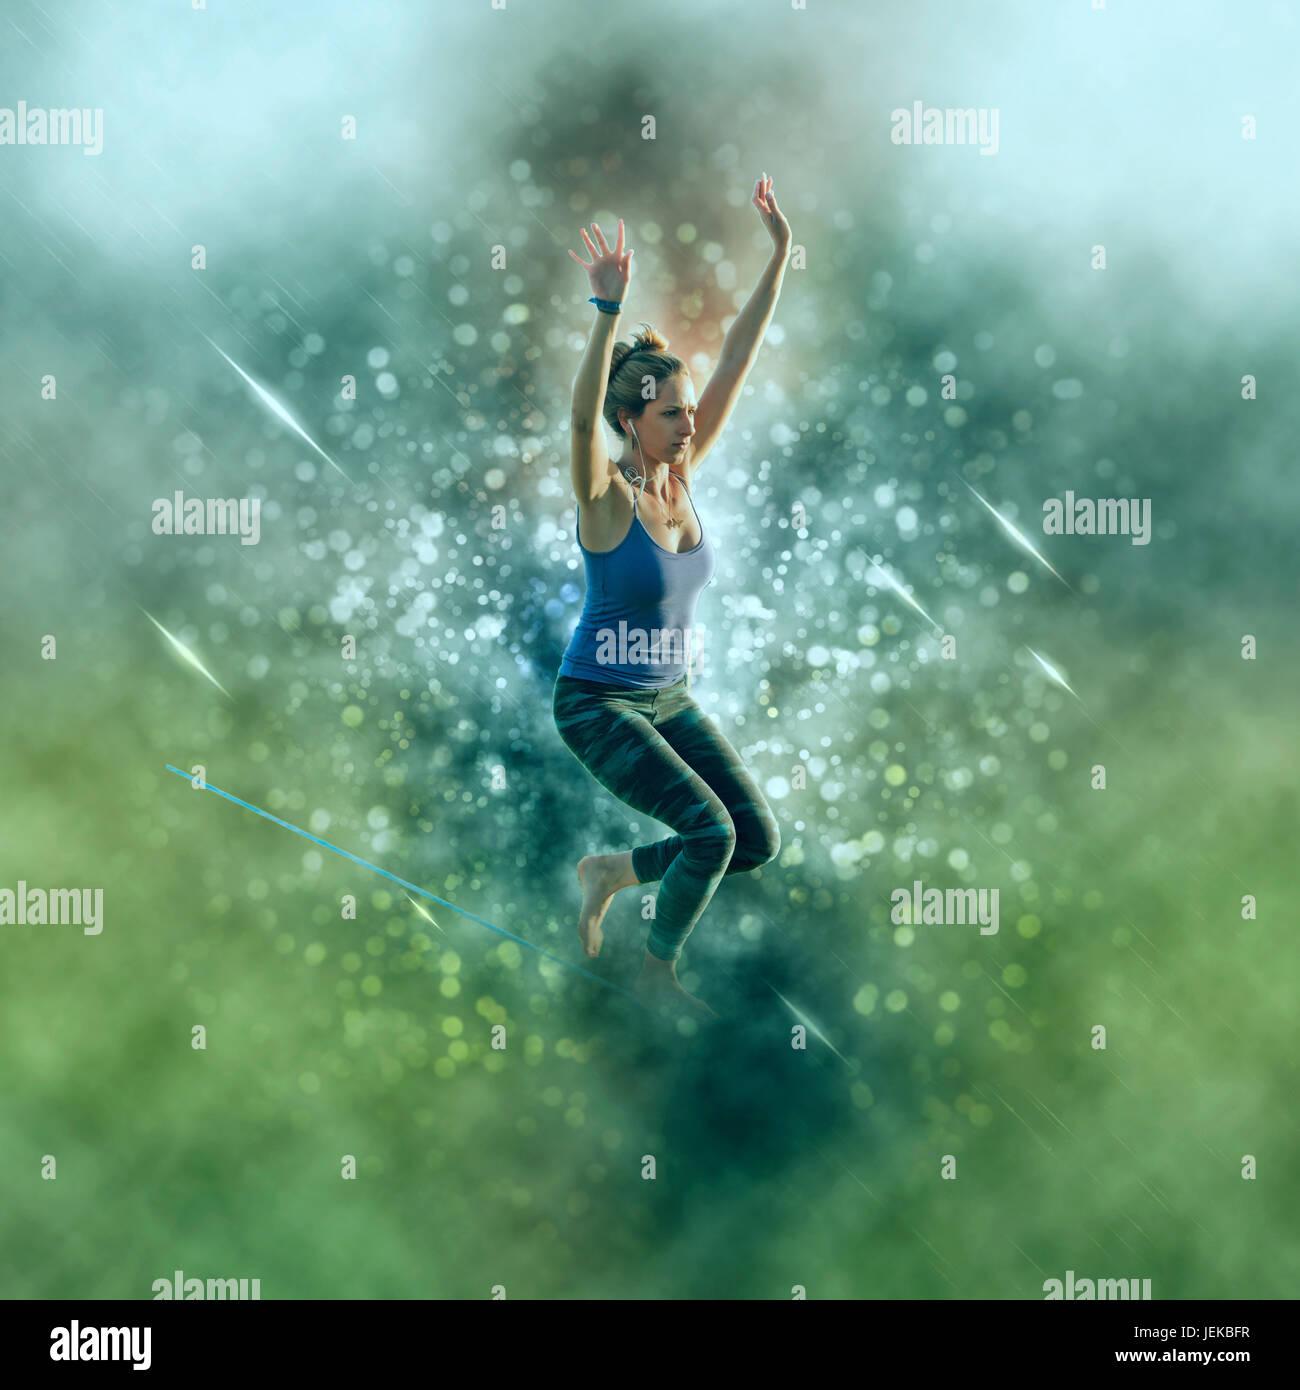 Digitally enhanced image of a woman Slacklining - Stock Image